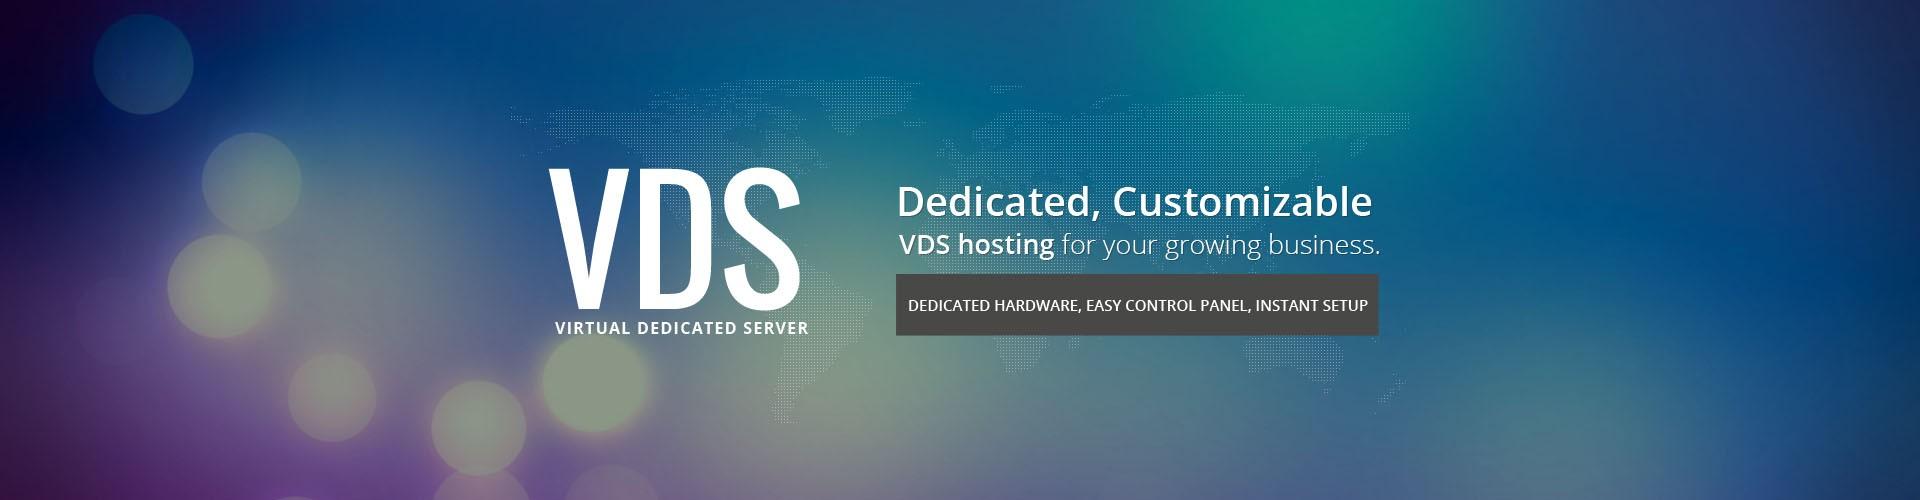 Virtual Dedicated Server